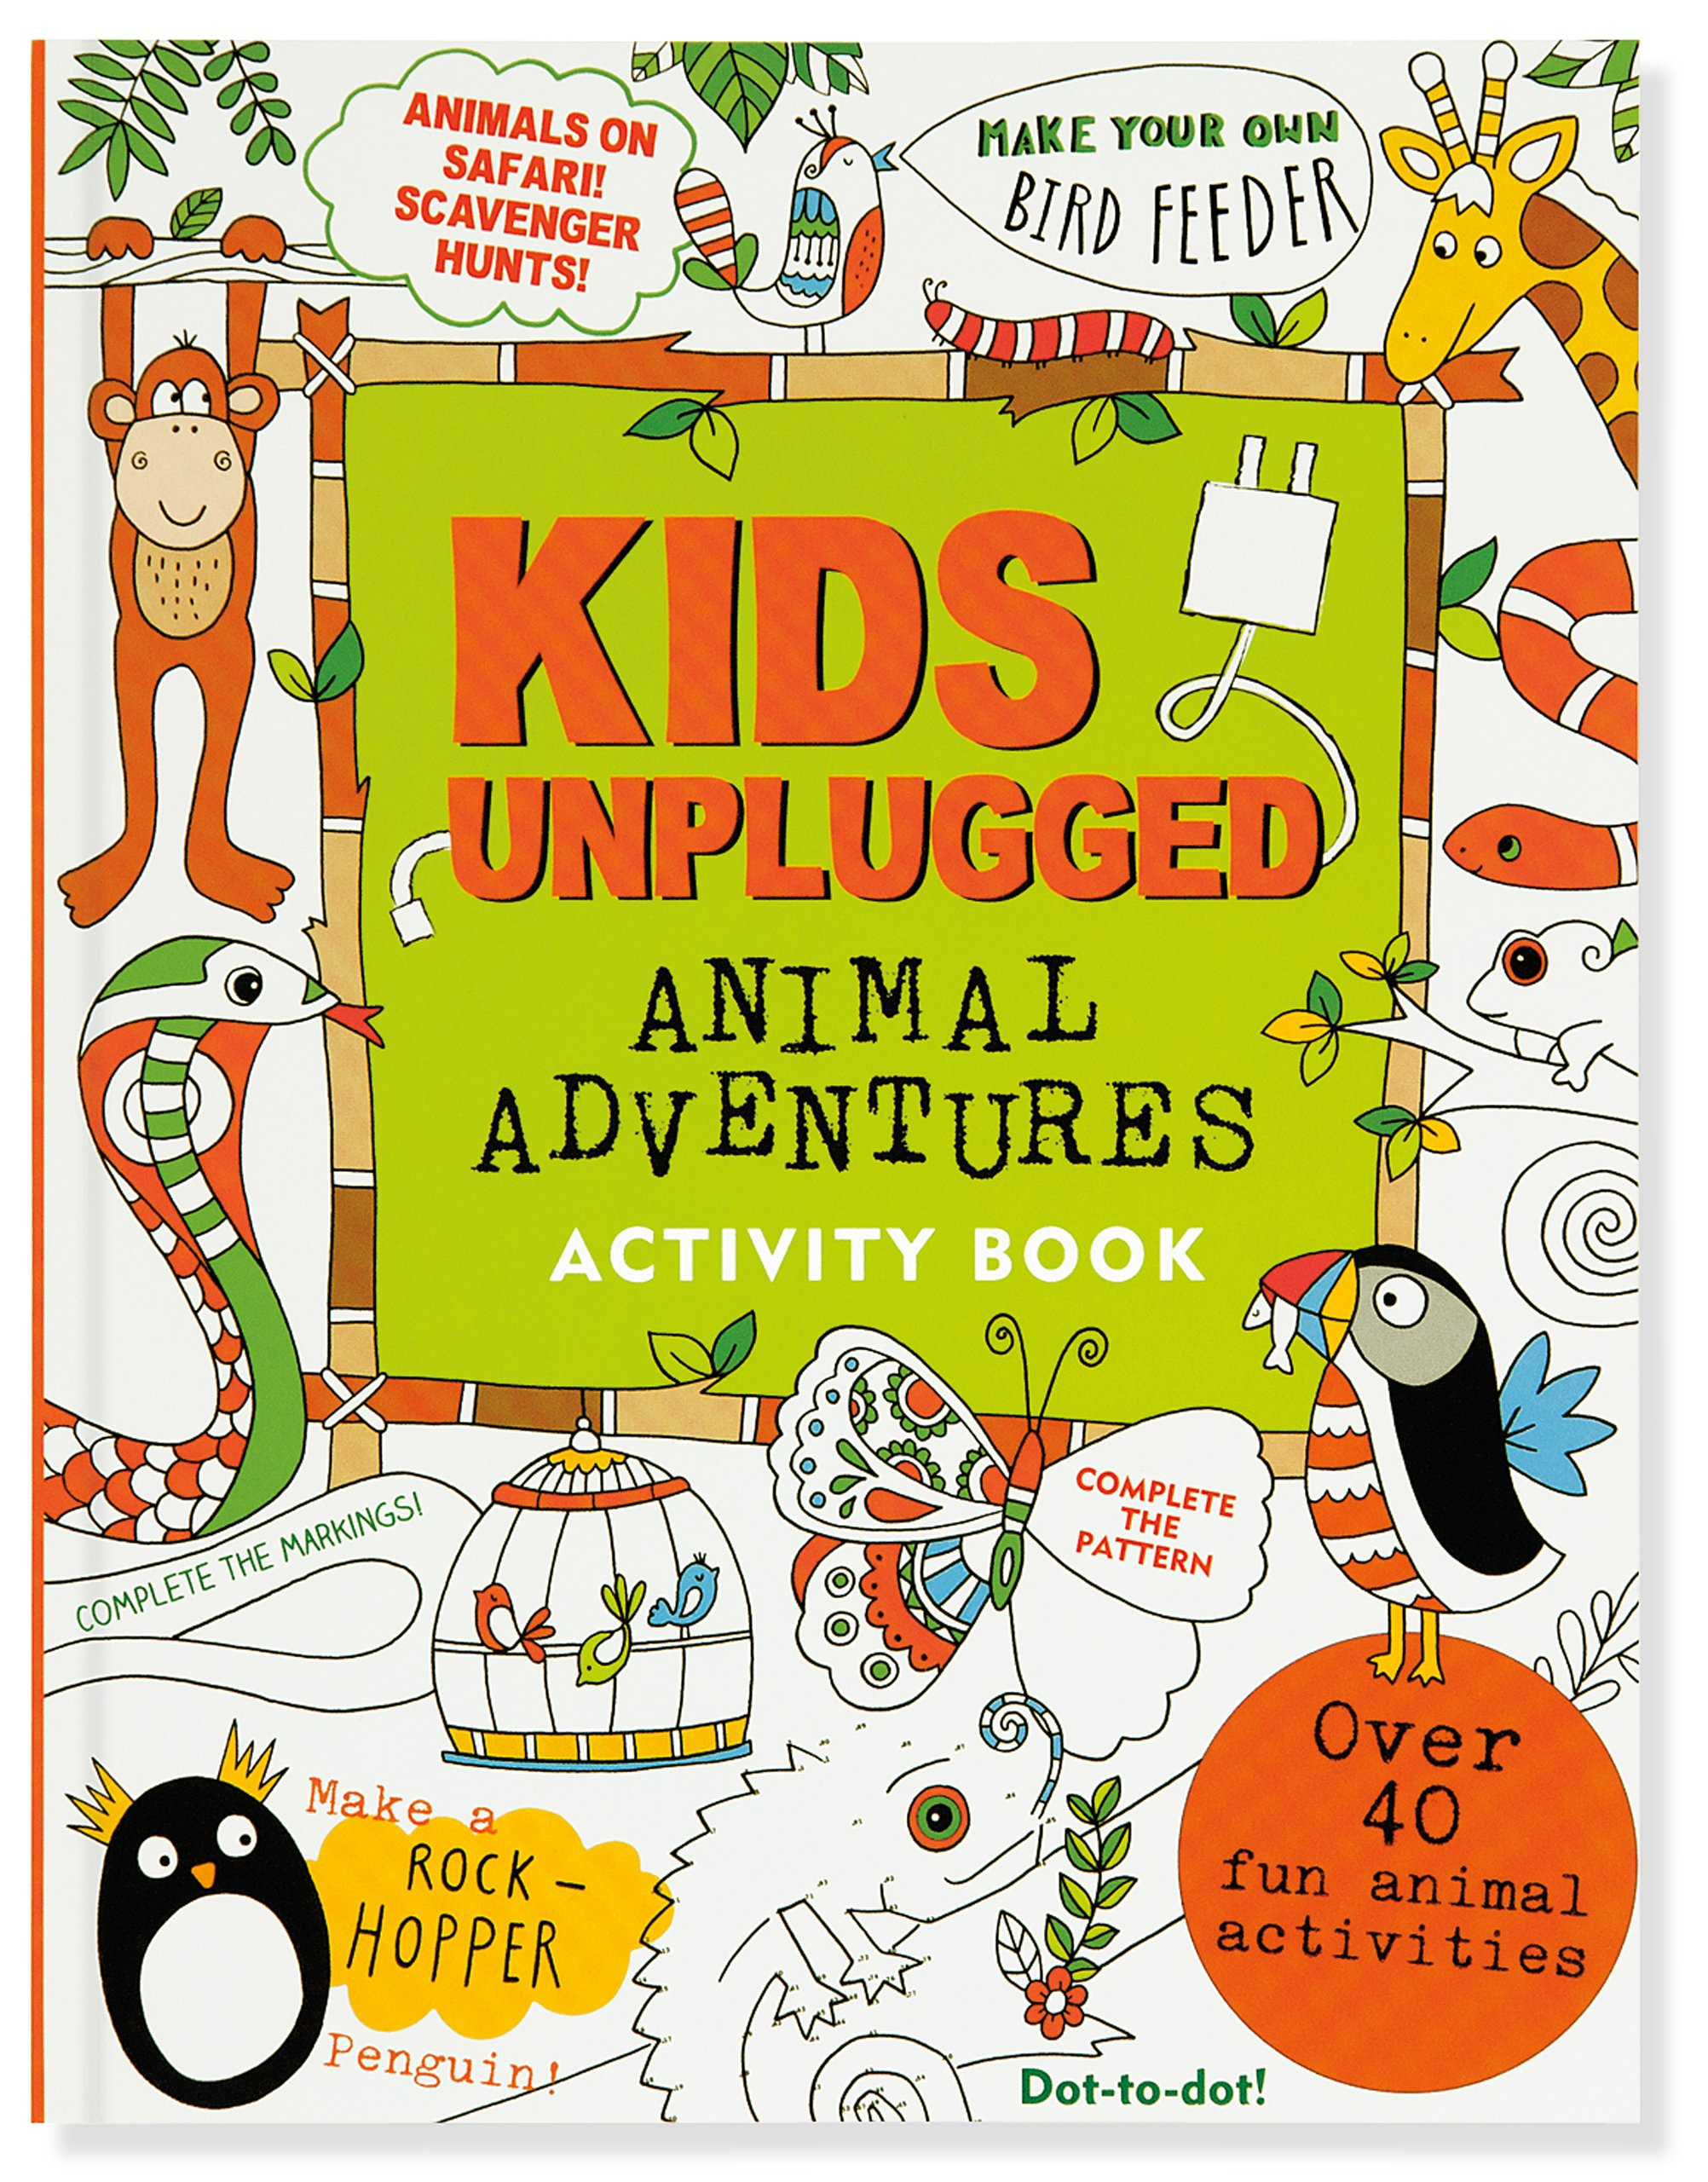 Kids Unplugged Animal Adventures Activity product image